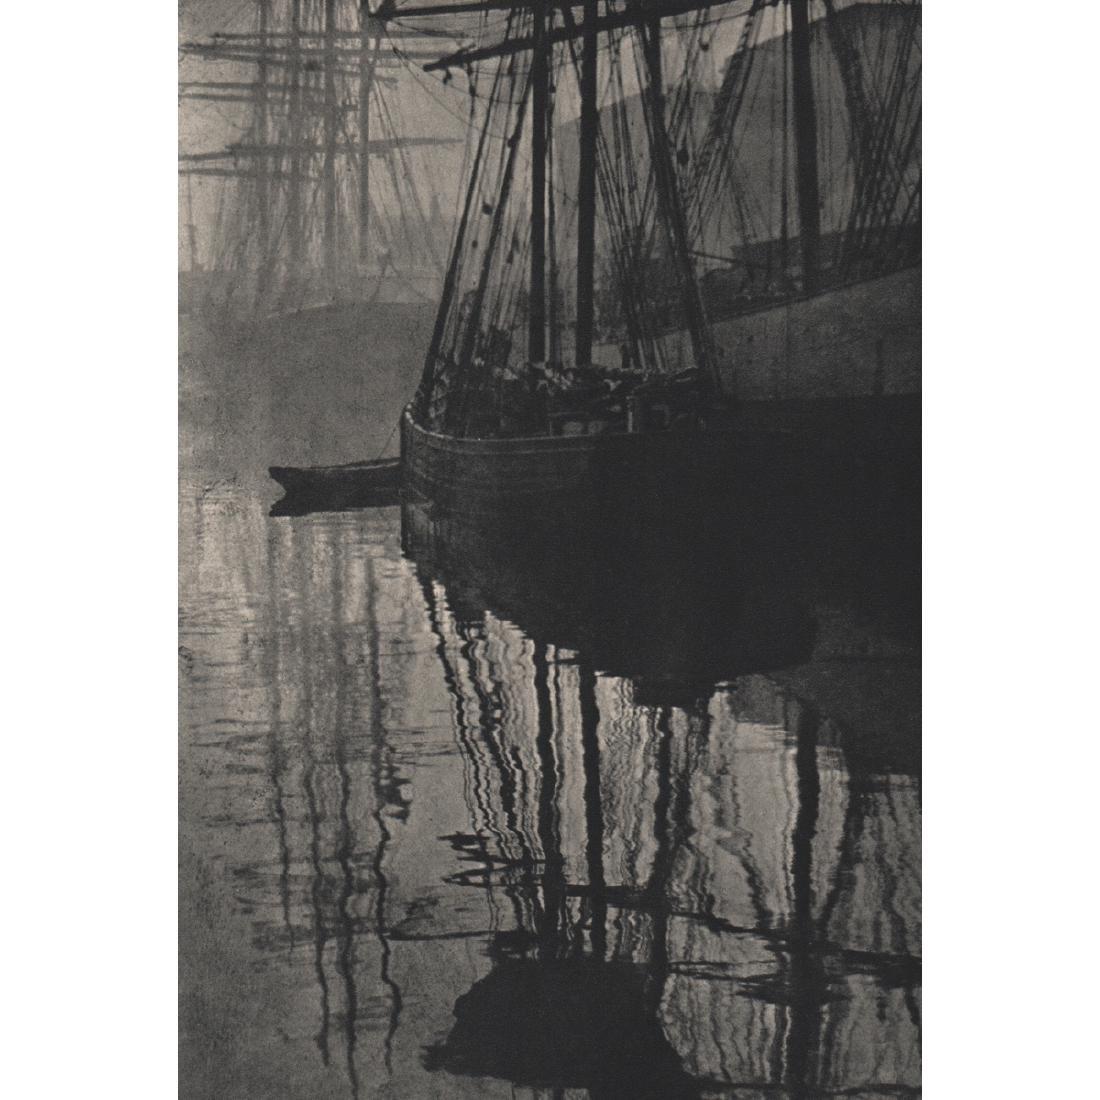 ALVIN LANGDON COBURN -  Spider Webs, Liverpool, 1906